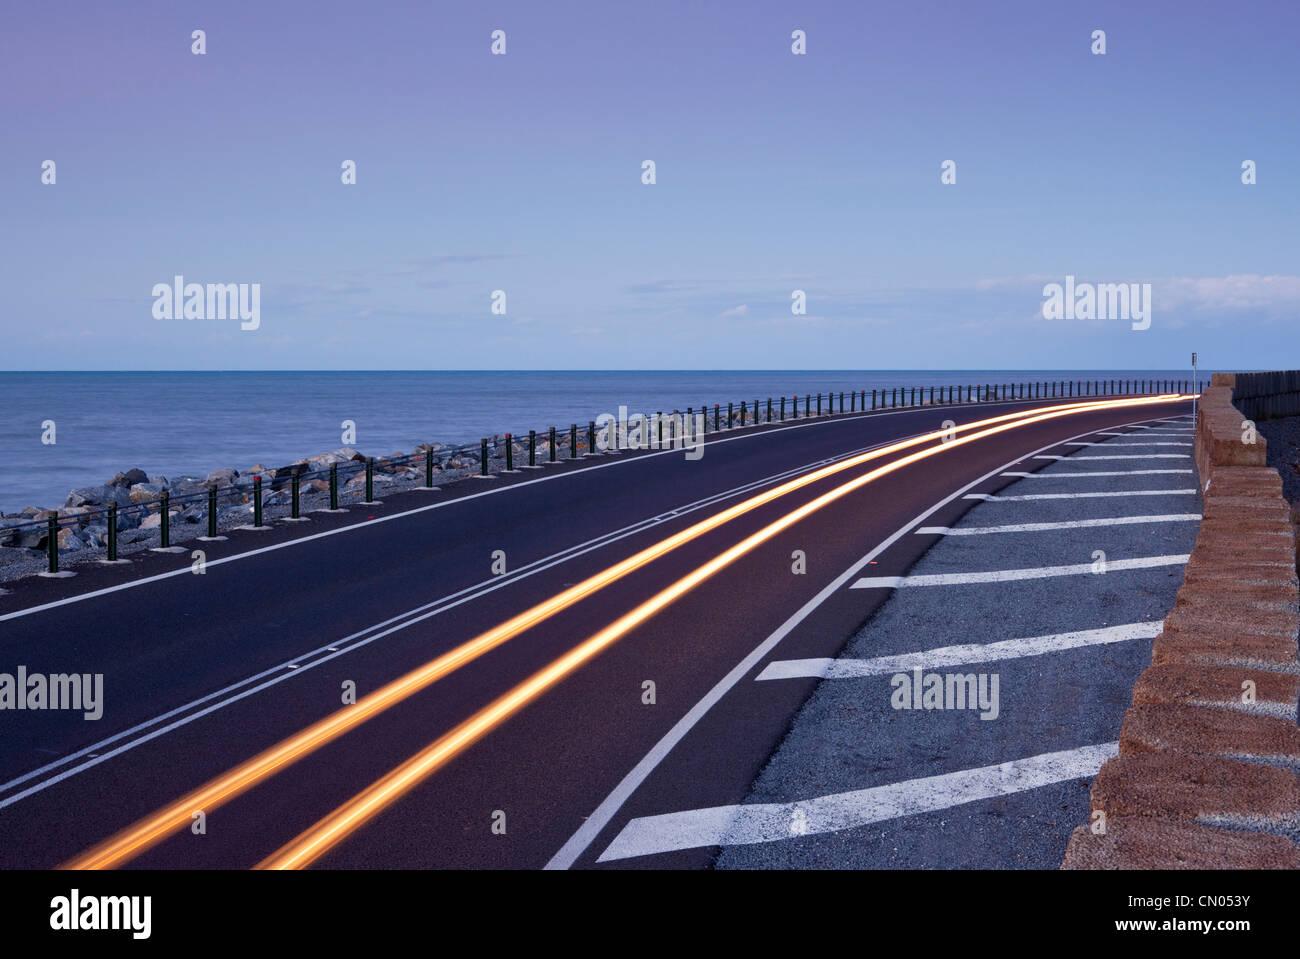 Car light trails on coastal highway.  Captain Cook Highway between Port Douglas and Cairns, Queensland, Australia - Stock Image